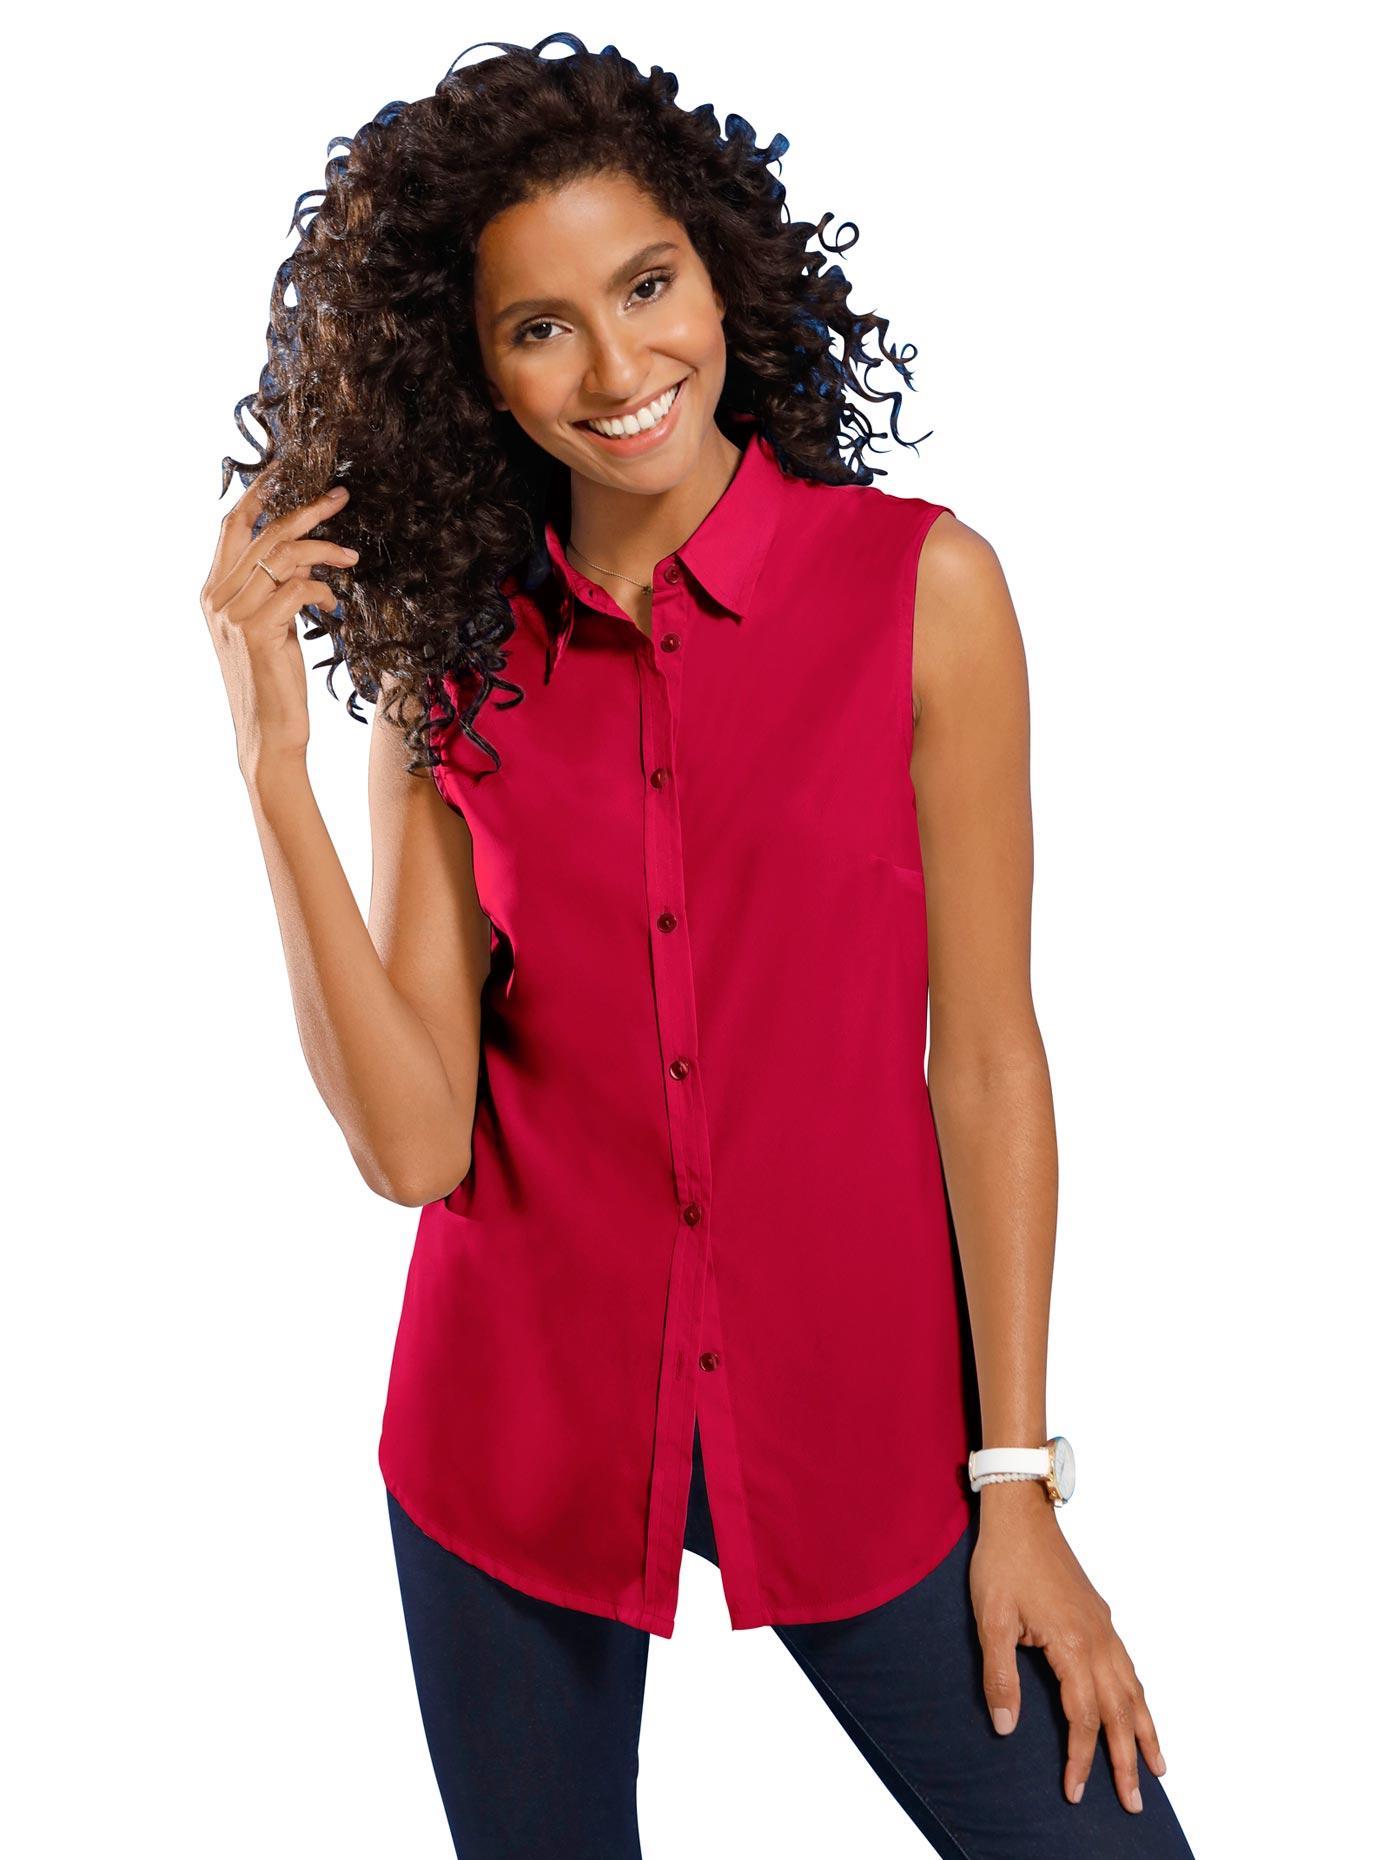 Classic Basics Bluse ohne Arm mit leicht abgerundetem Saum